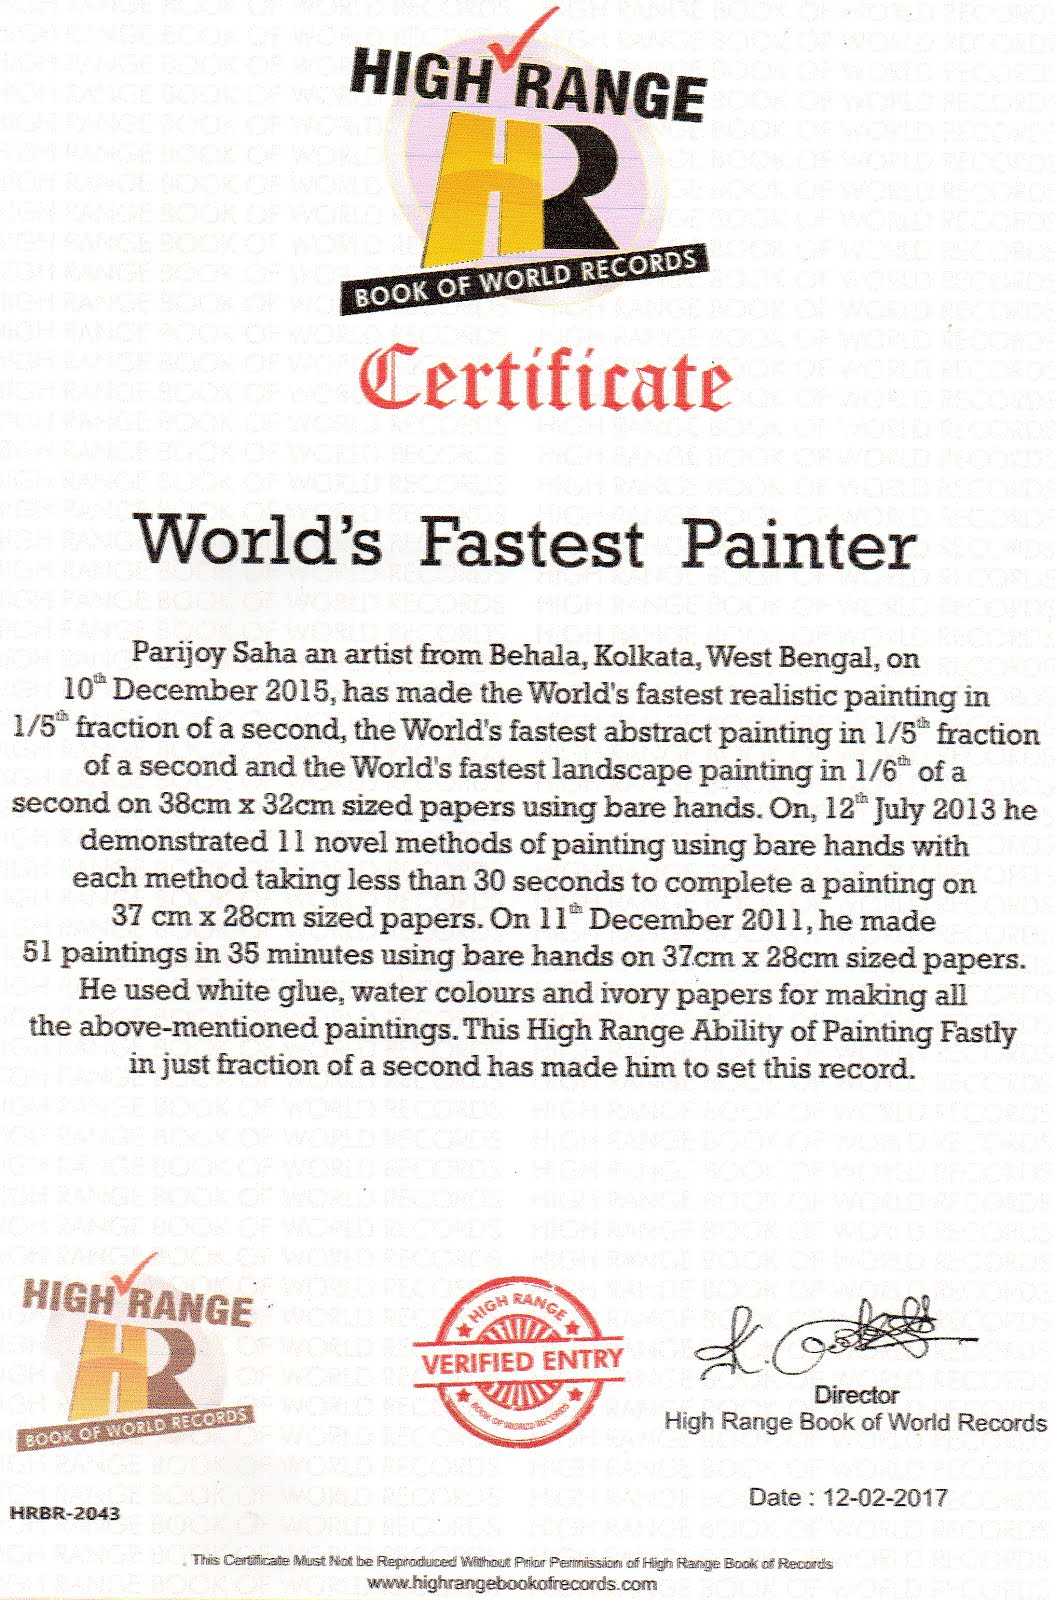 World's Fastest Painter